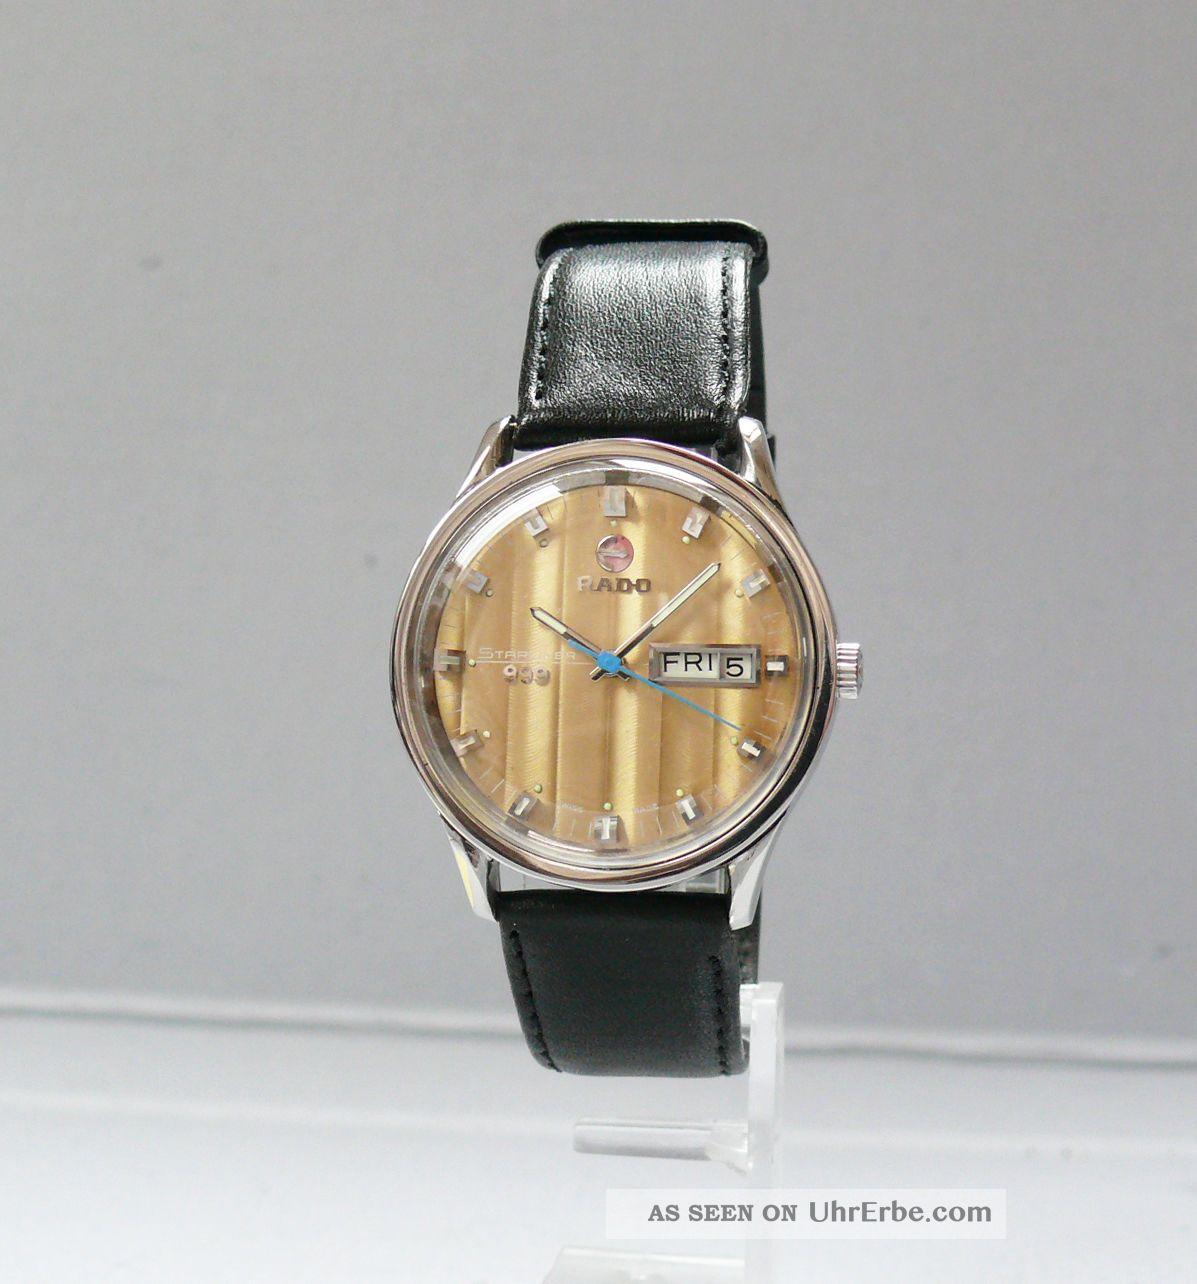 Rado Starliner 999 Automatic 1970´er Jahre (17.  73 - 513) Armbanduhren Bild